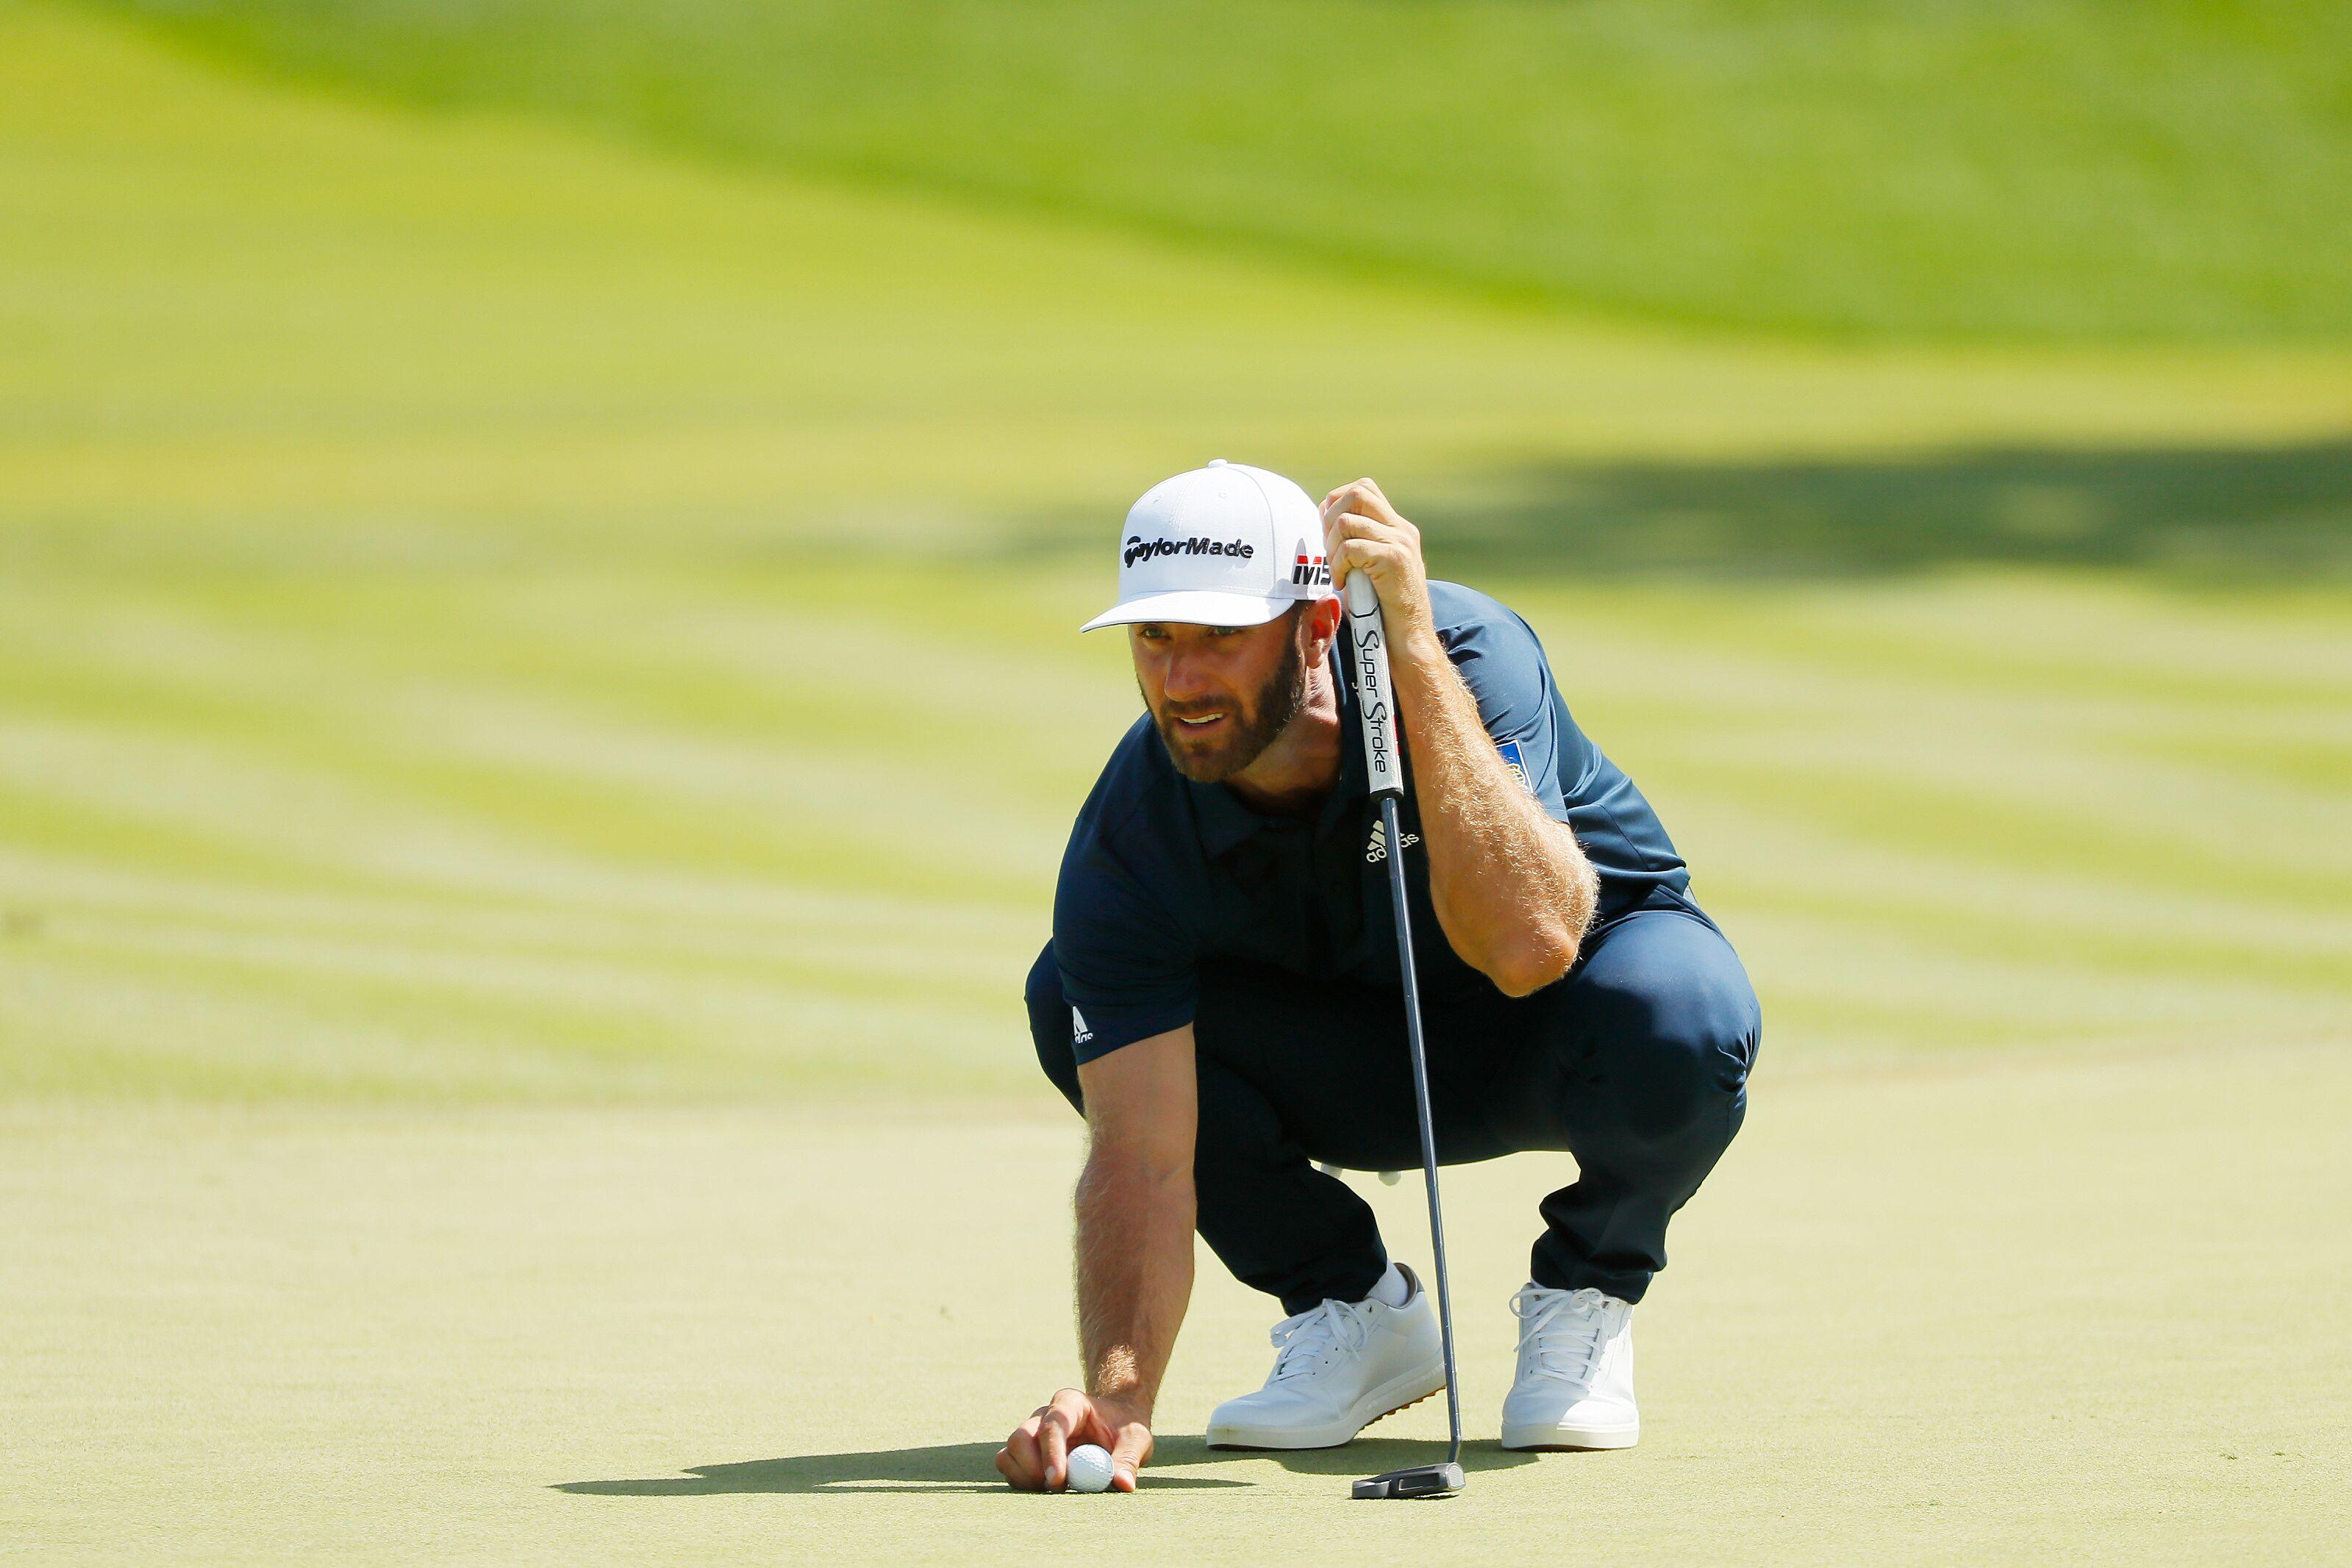 DraftKings PGA: 2019 BMW Championship Picks and Analysis